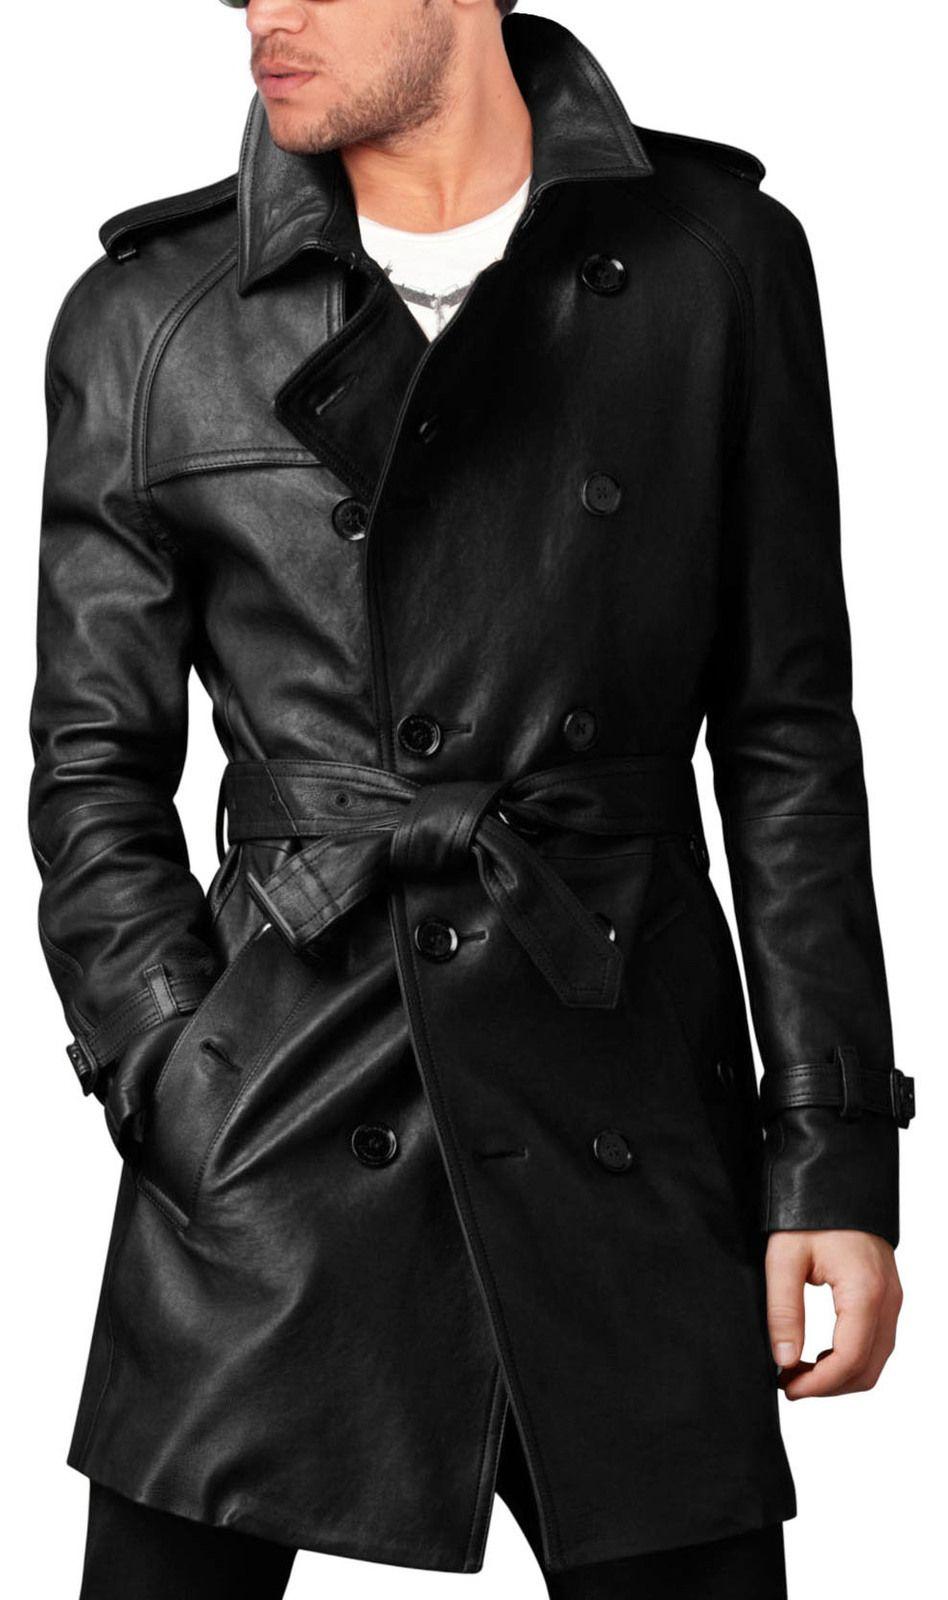 Men\u2019s leather coat Gift for him Leather coat Morethebuckles Men\u2019s coat Men\u2019s dress leather coat Men\u2019s coat Merona Large Men\u2019s coat